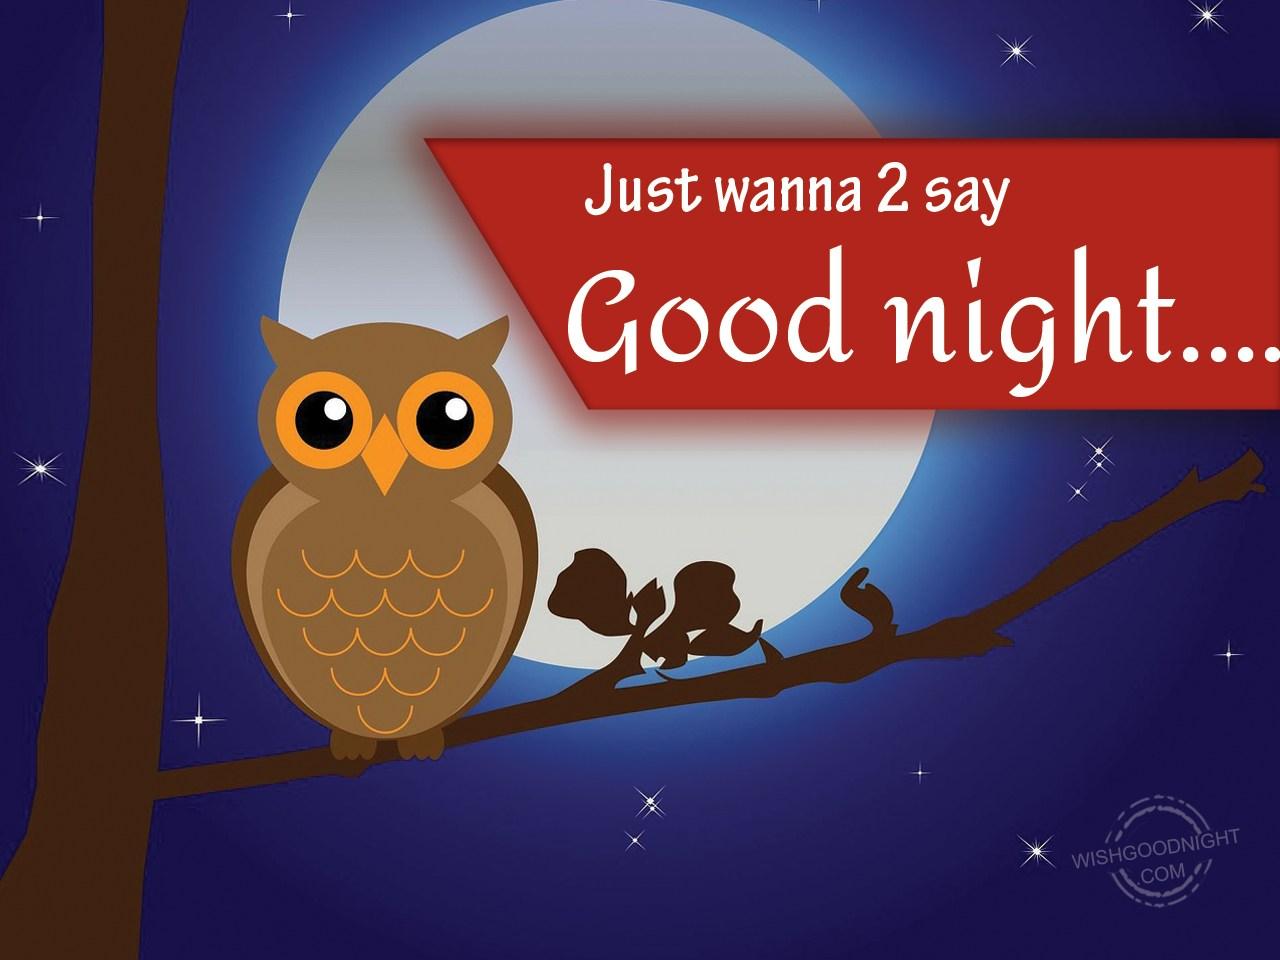 Just Wanna To Say Good Night Good Night Pictures Wishgoodnightcom